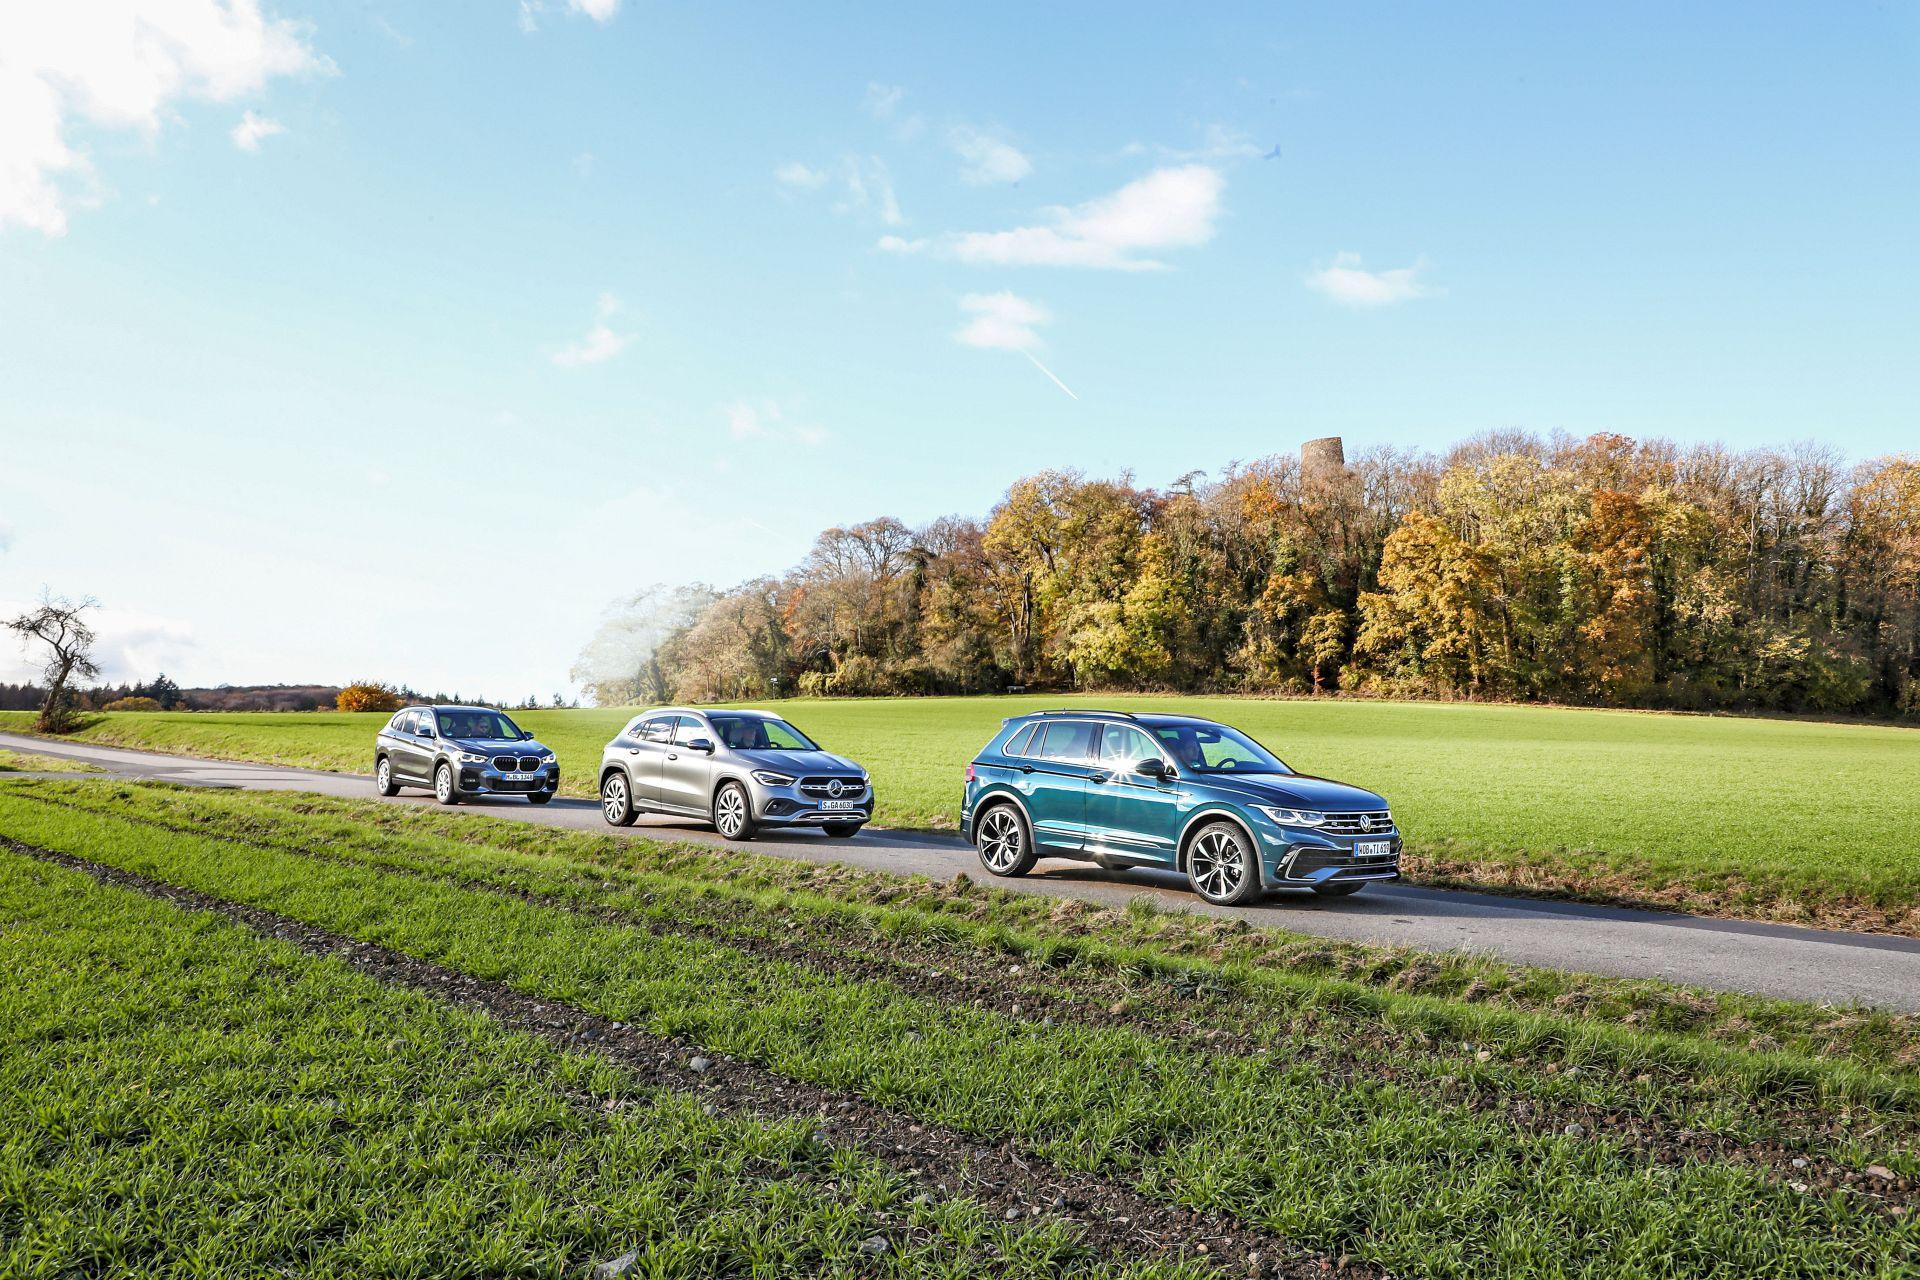 Mercedes_GLA_VW_Tiguan_BMX_X1_1120_Gotta_14